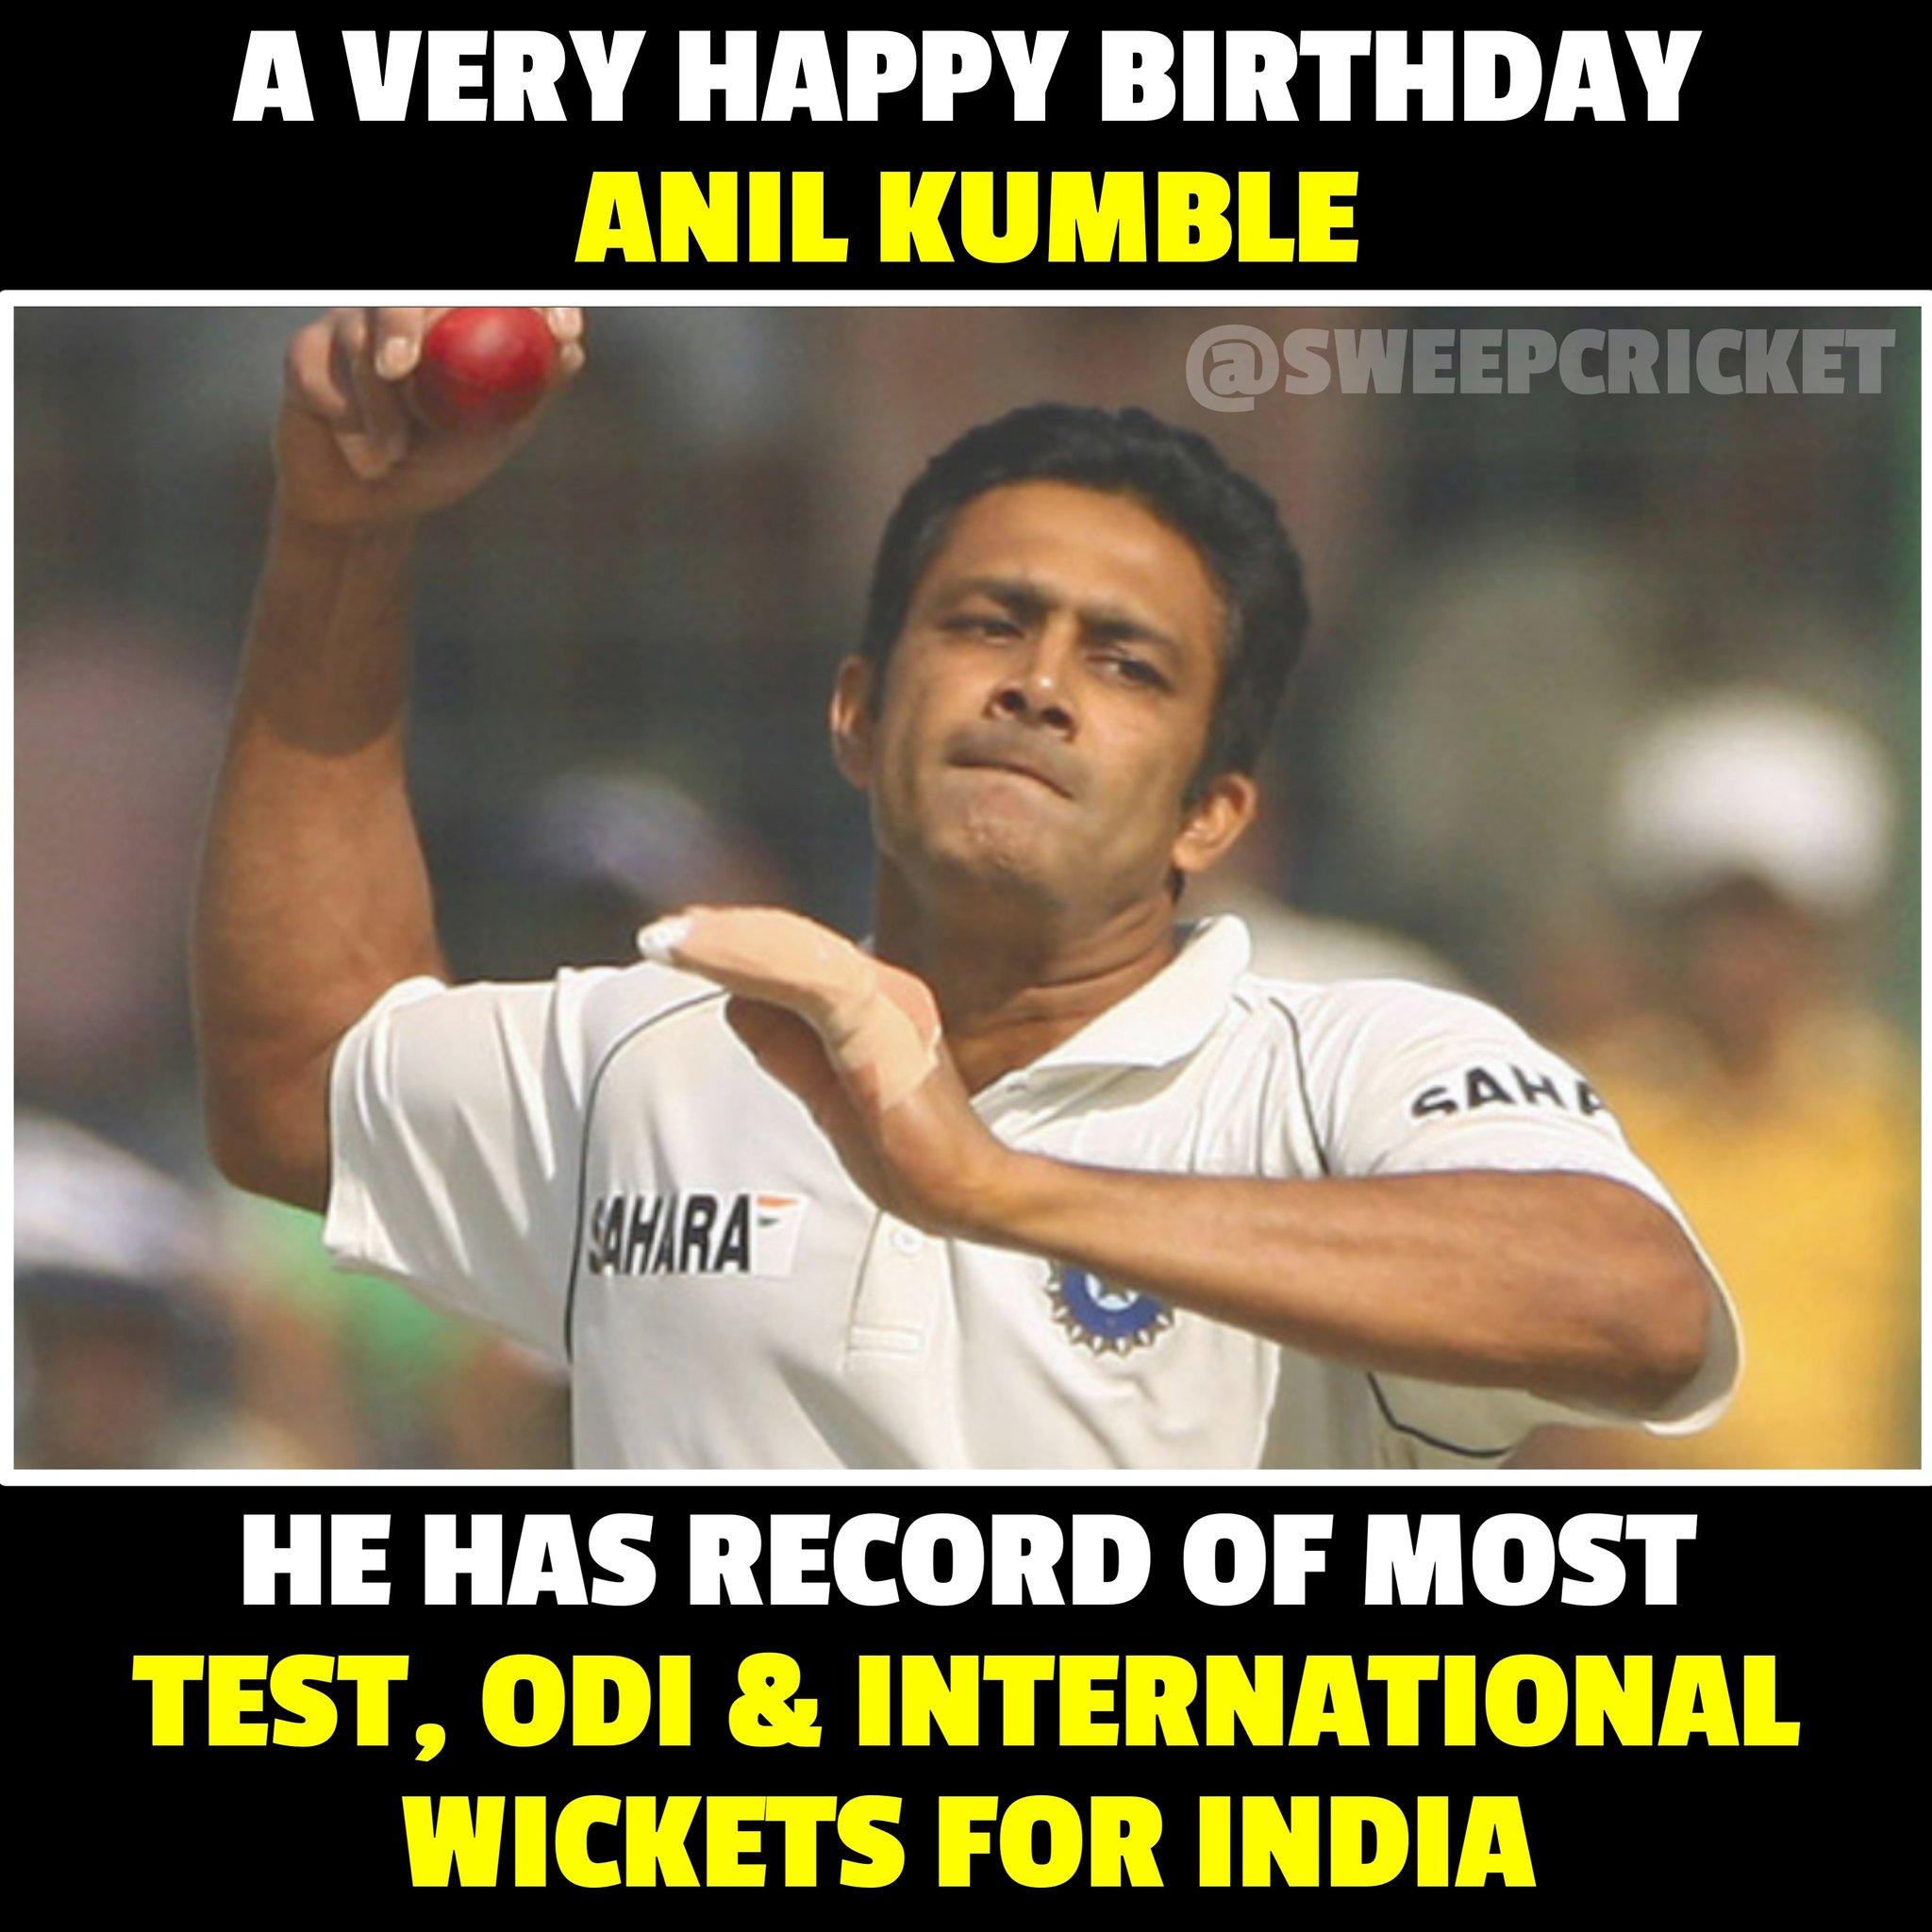 A very Happy Birthday Anil Kumble